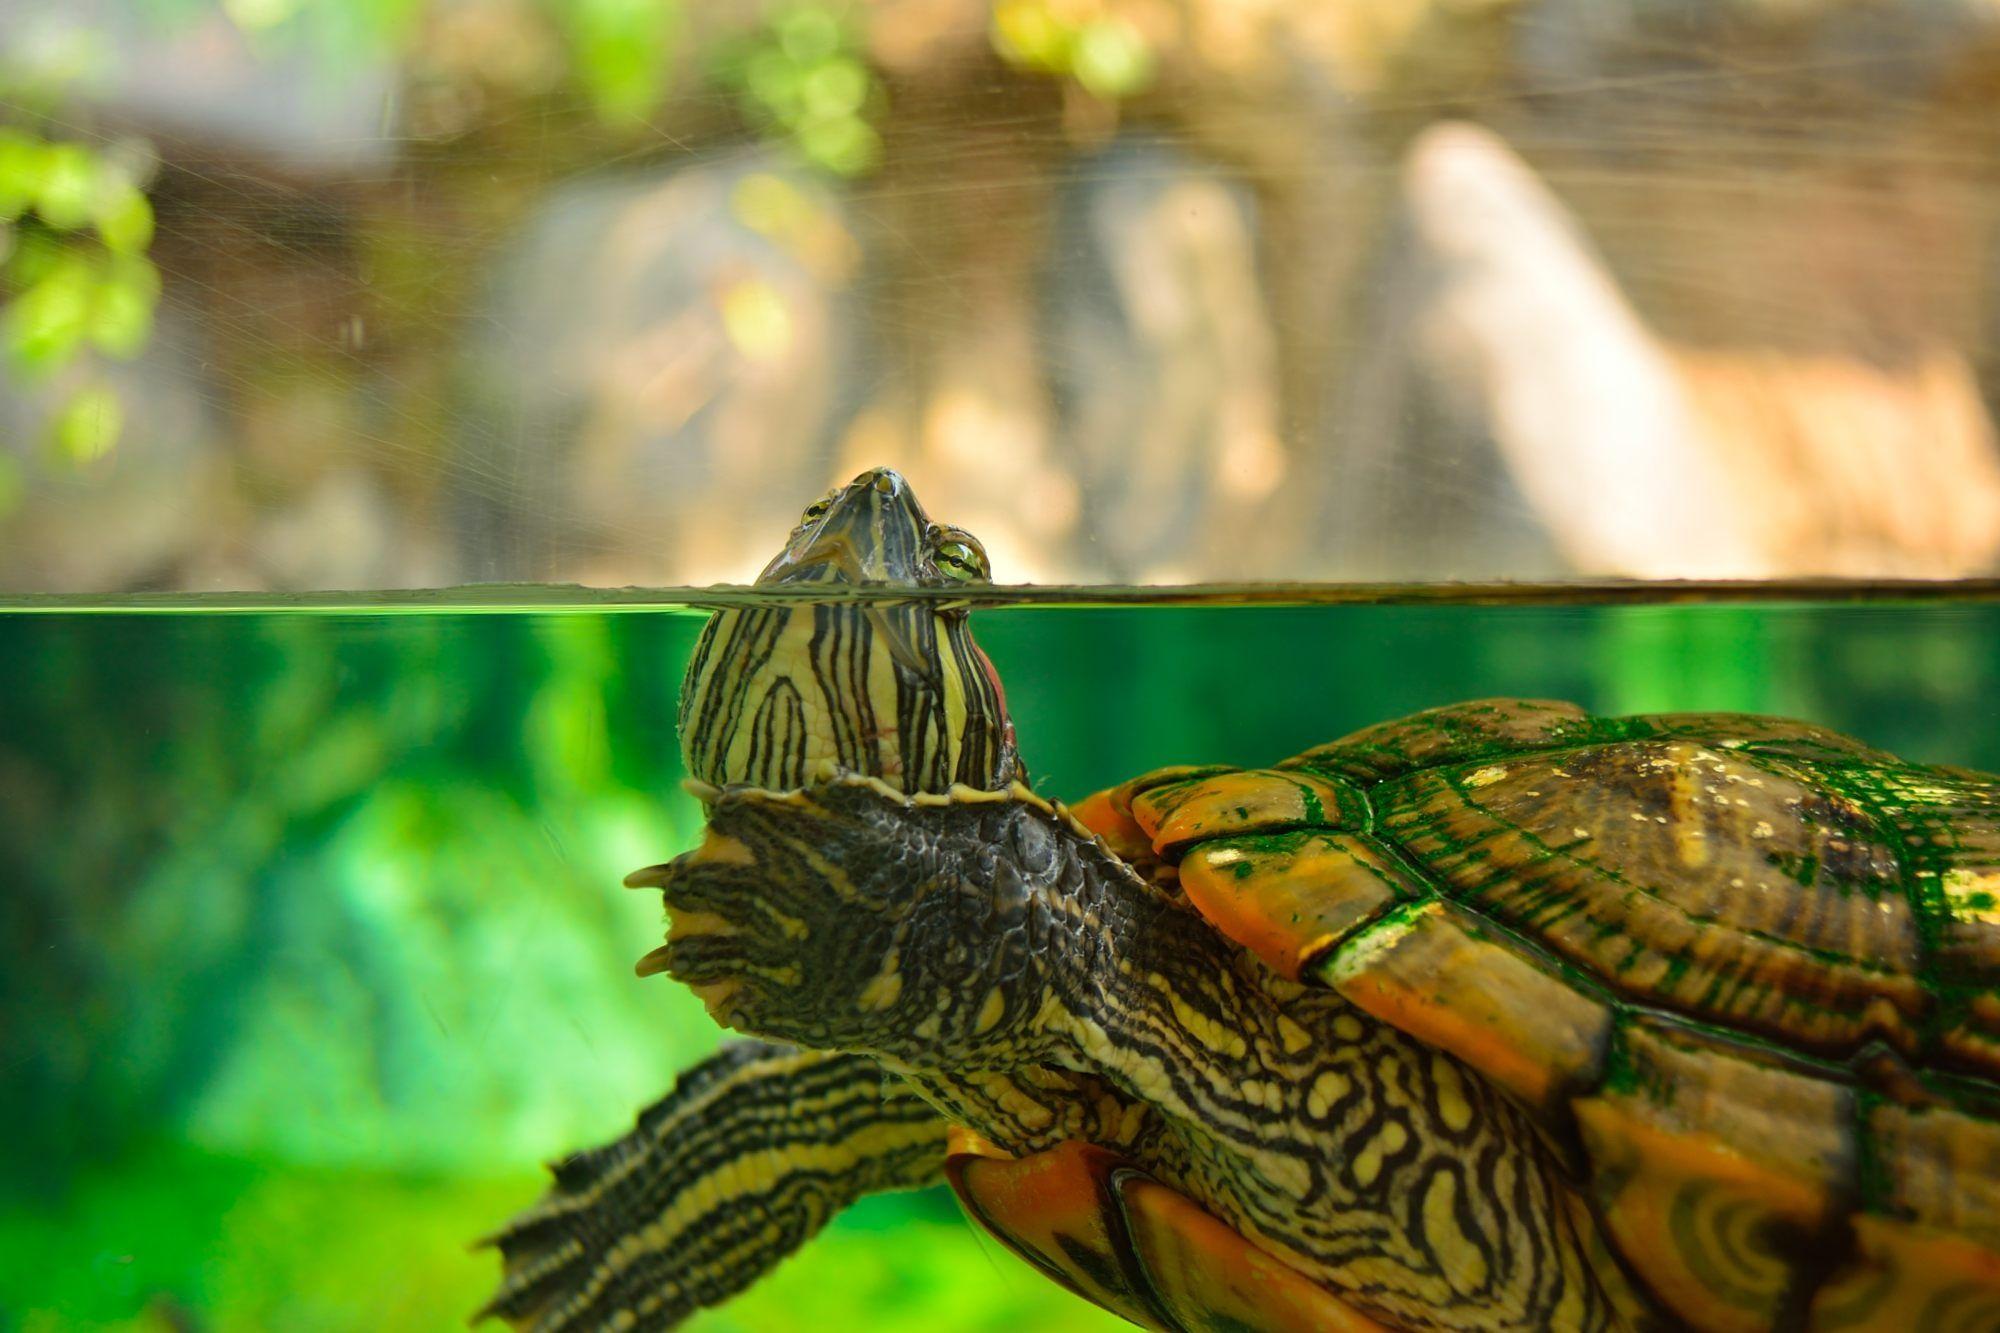 Turtle by Daniel  on 500px